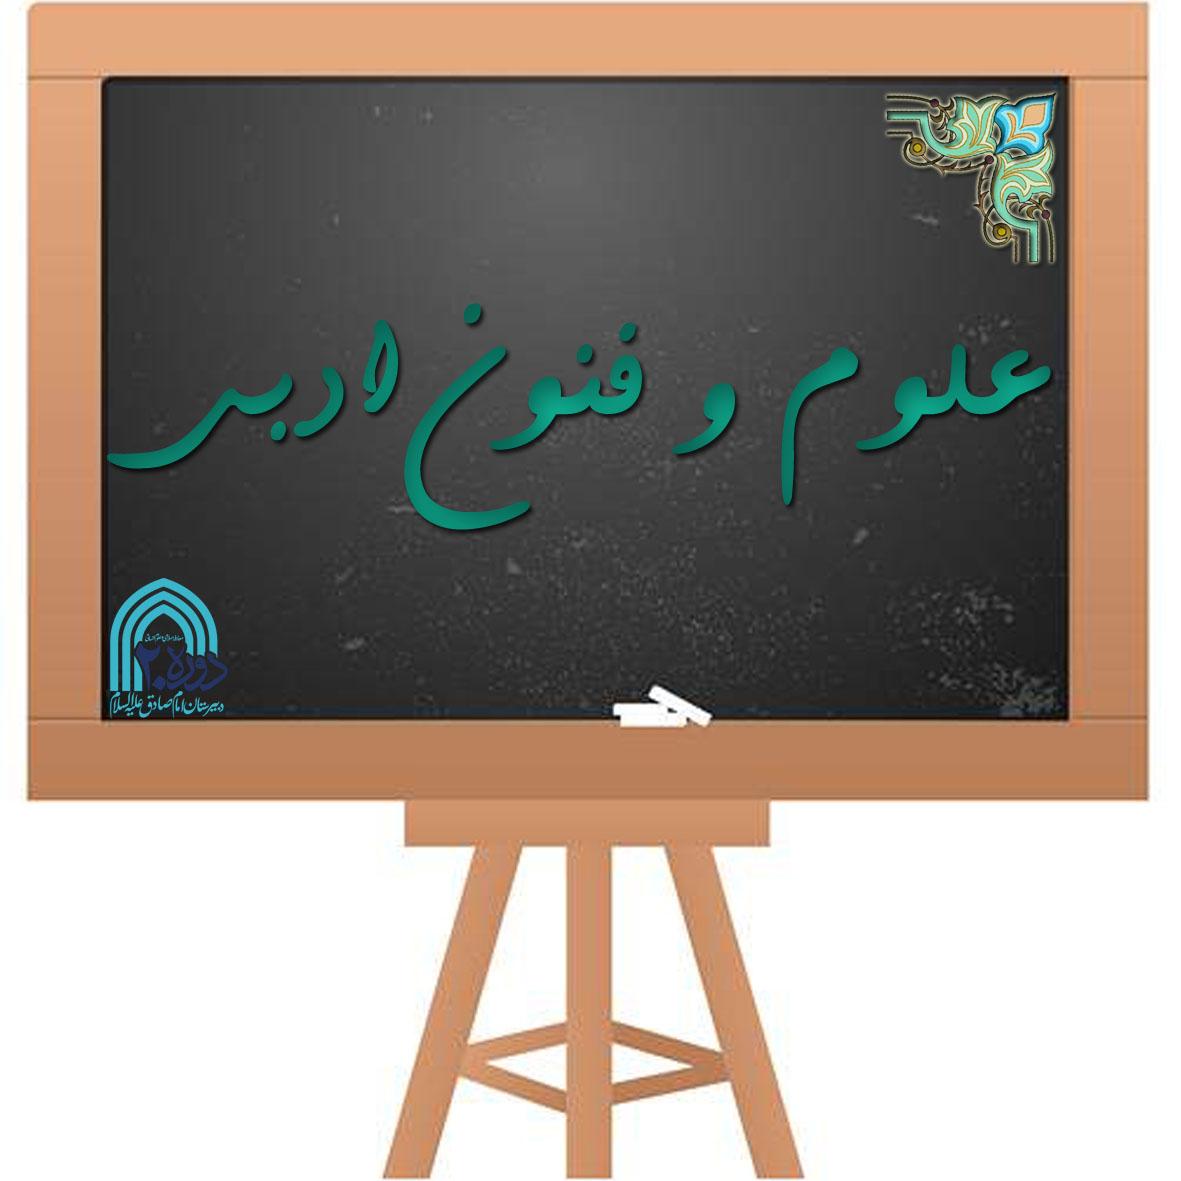 کلاس علوم و فنون ادبی استاد مومنی